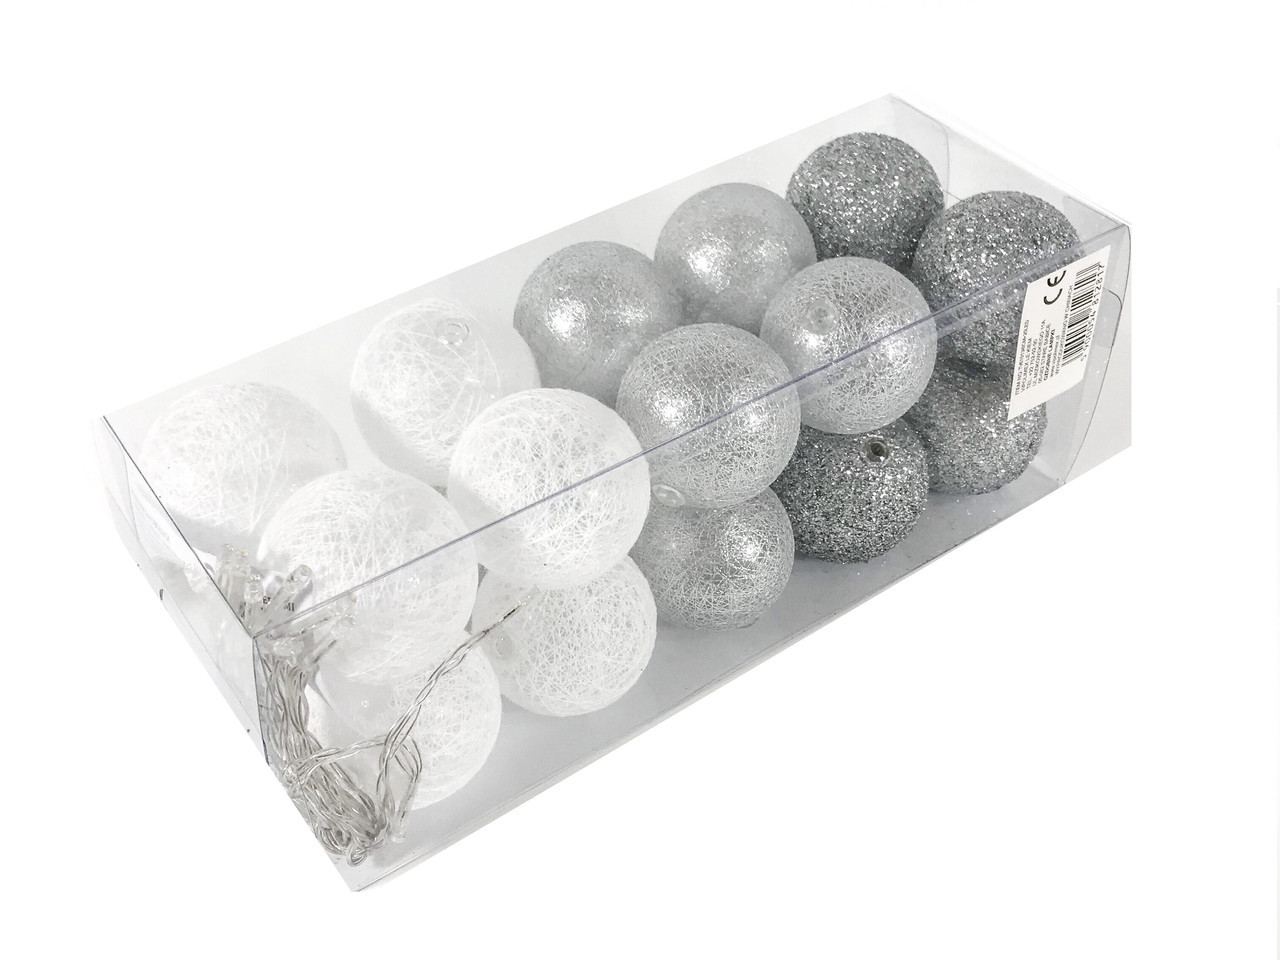 Гирлянда Тайские Шарики LTL Cold Cotton Balls 20led, диам 6см, длина 330см на батарейках АА